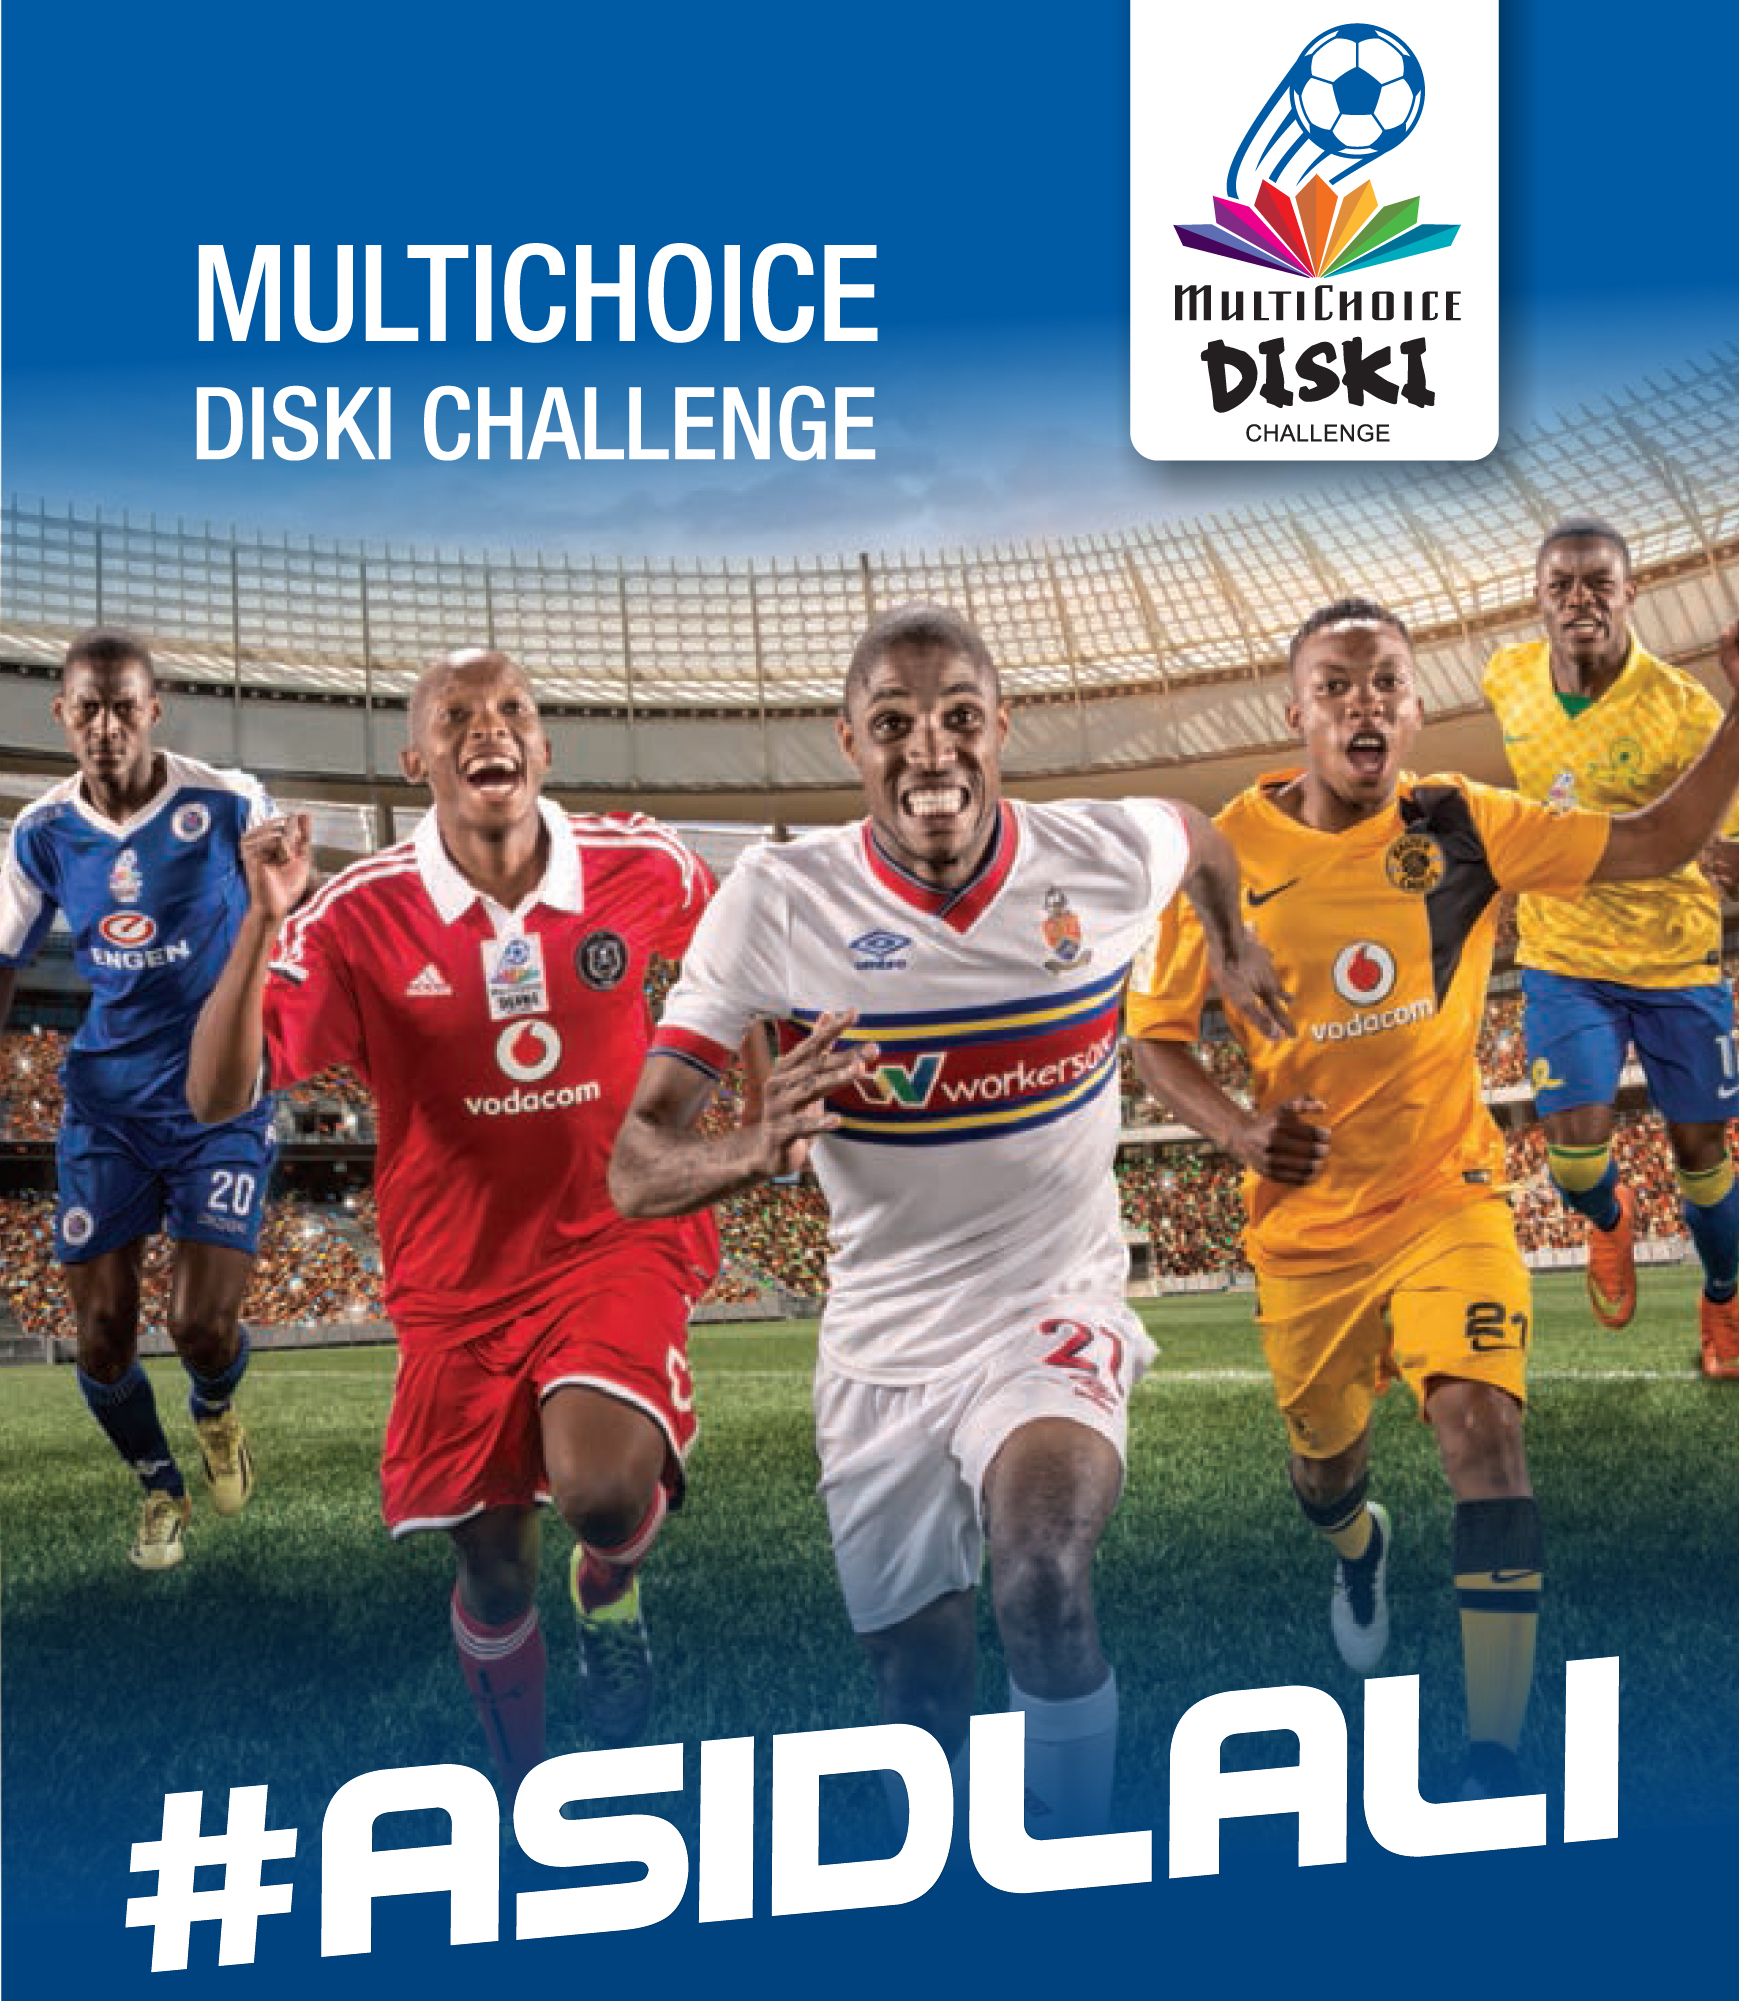 Mutichoice Diski Challenge kicks off on 5 September